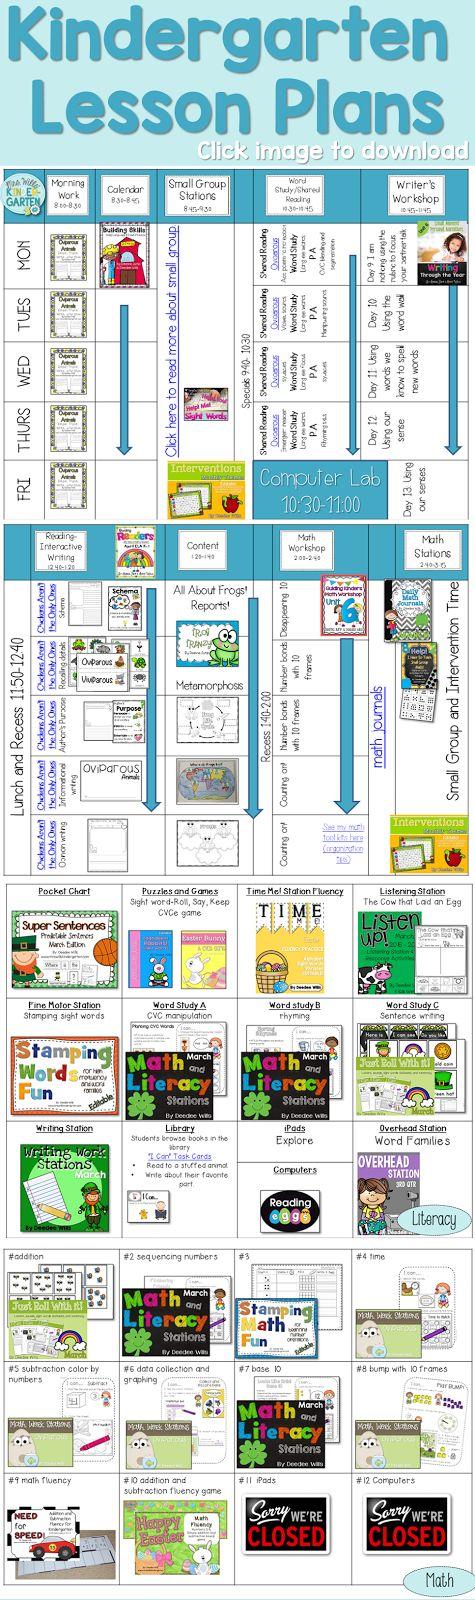 Kindergarten Calendar Time Lesson Plan : Oviparous animals lesson plans peek at my week